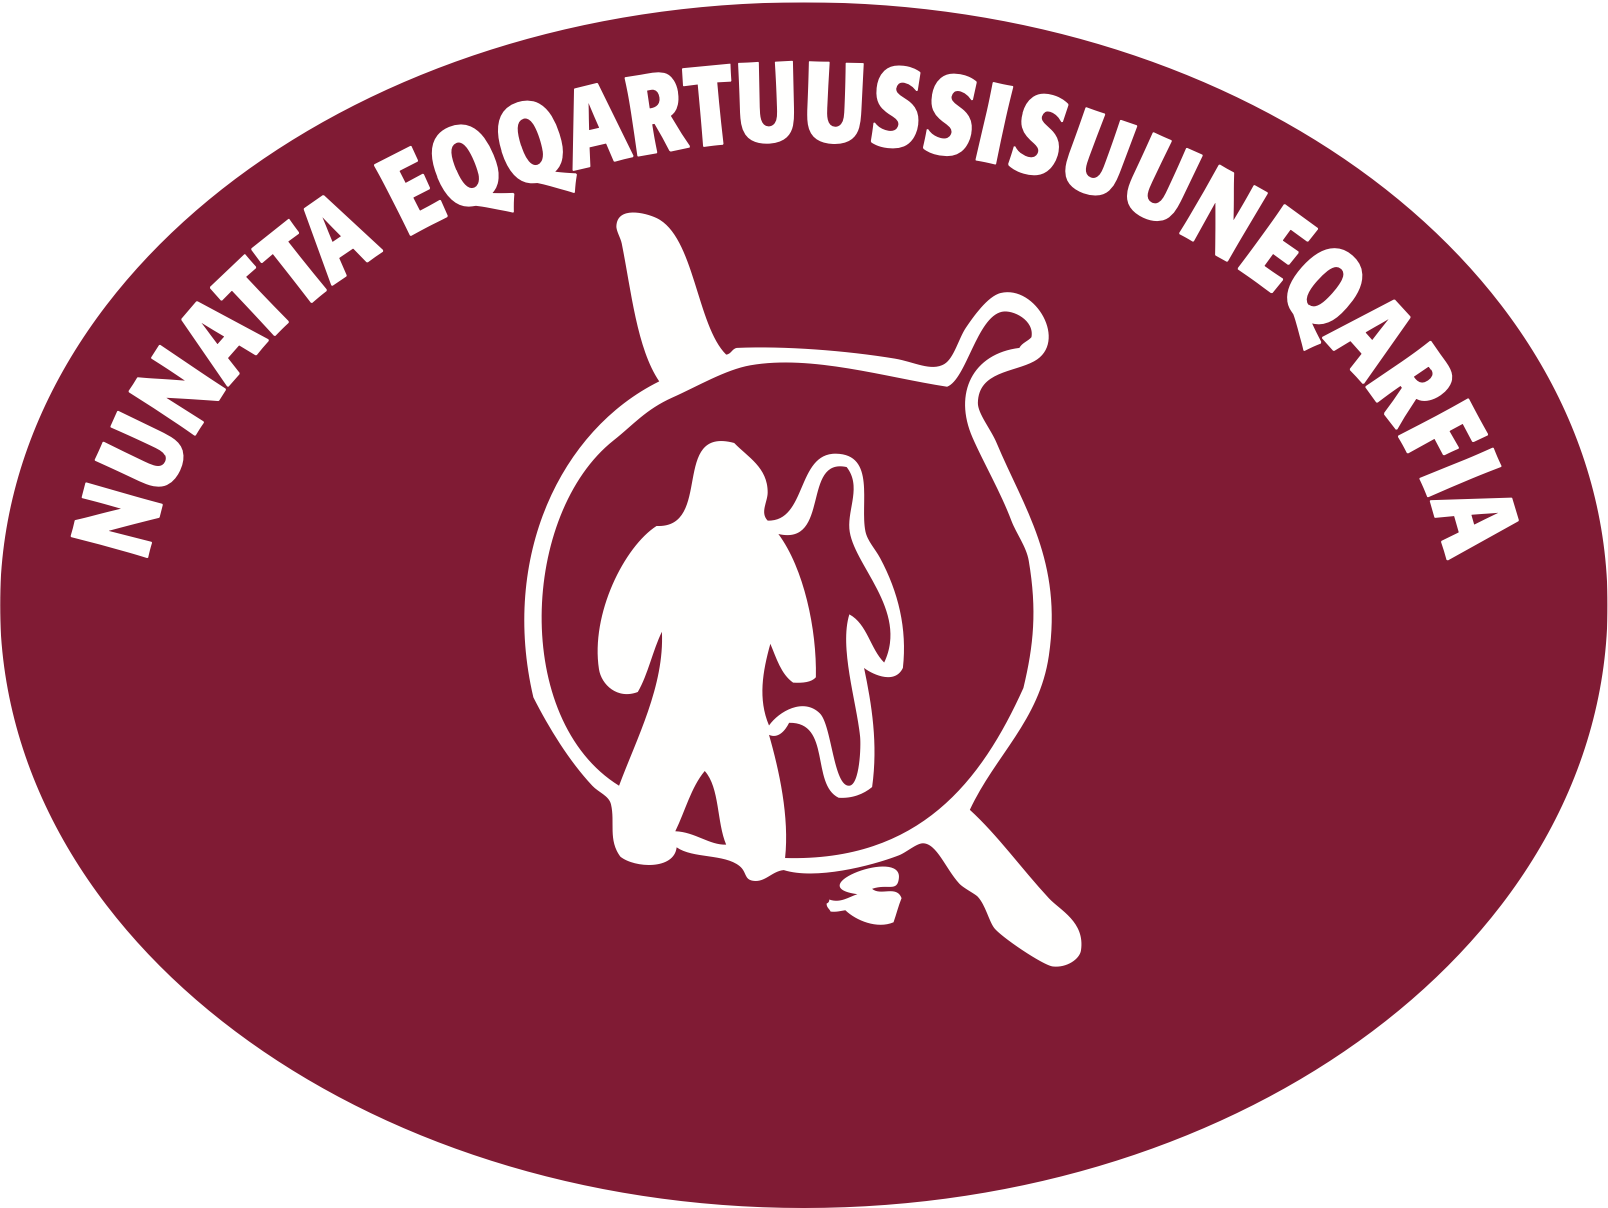 Nunatta Eqqartuussisuuneqarfia